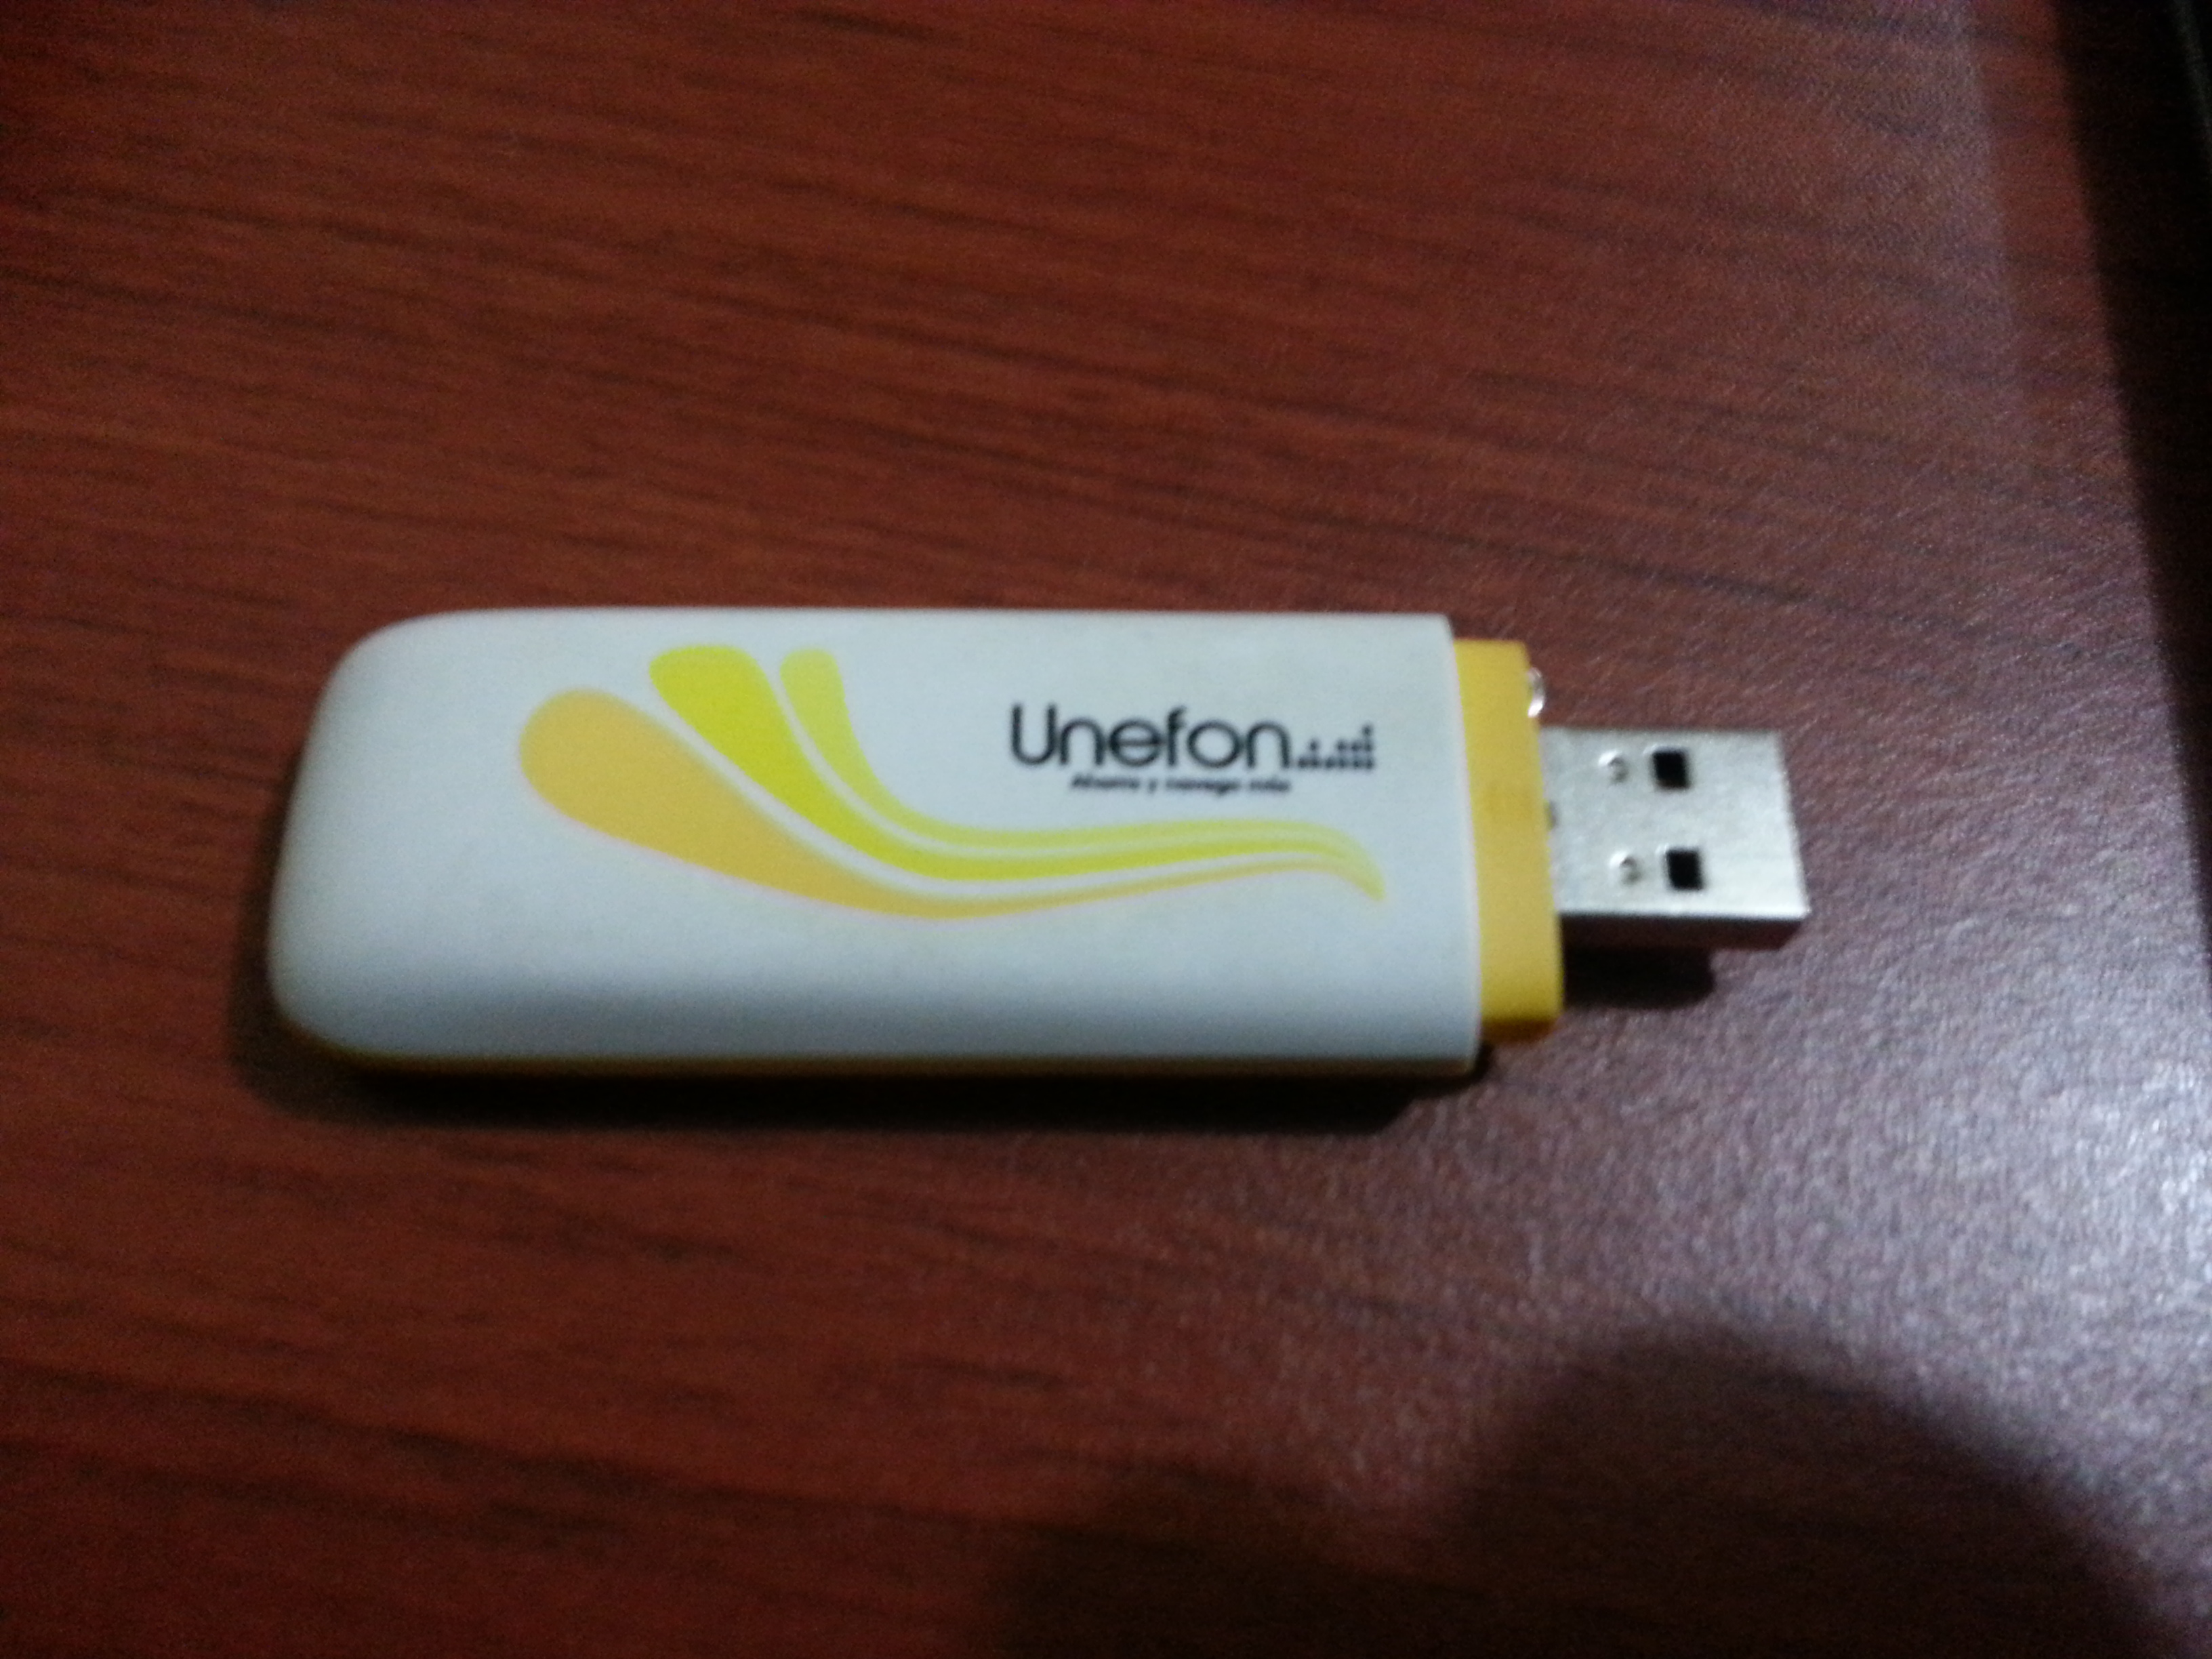 Implementar un telular con un modem 3G en asterisk a bajo costo